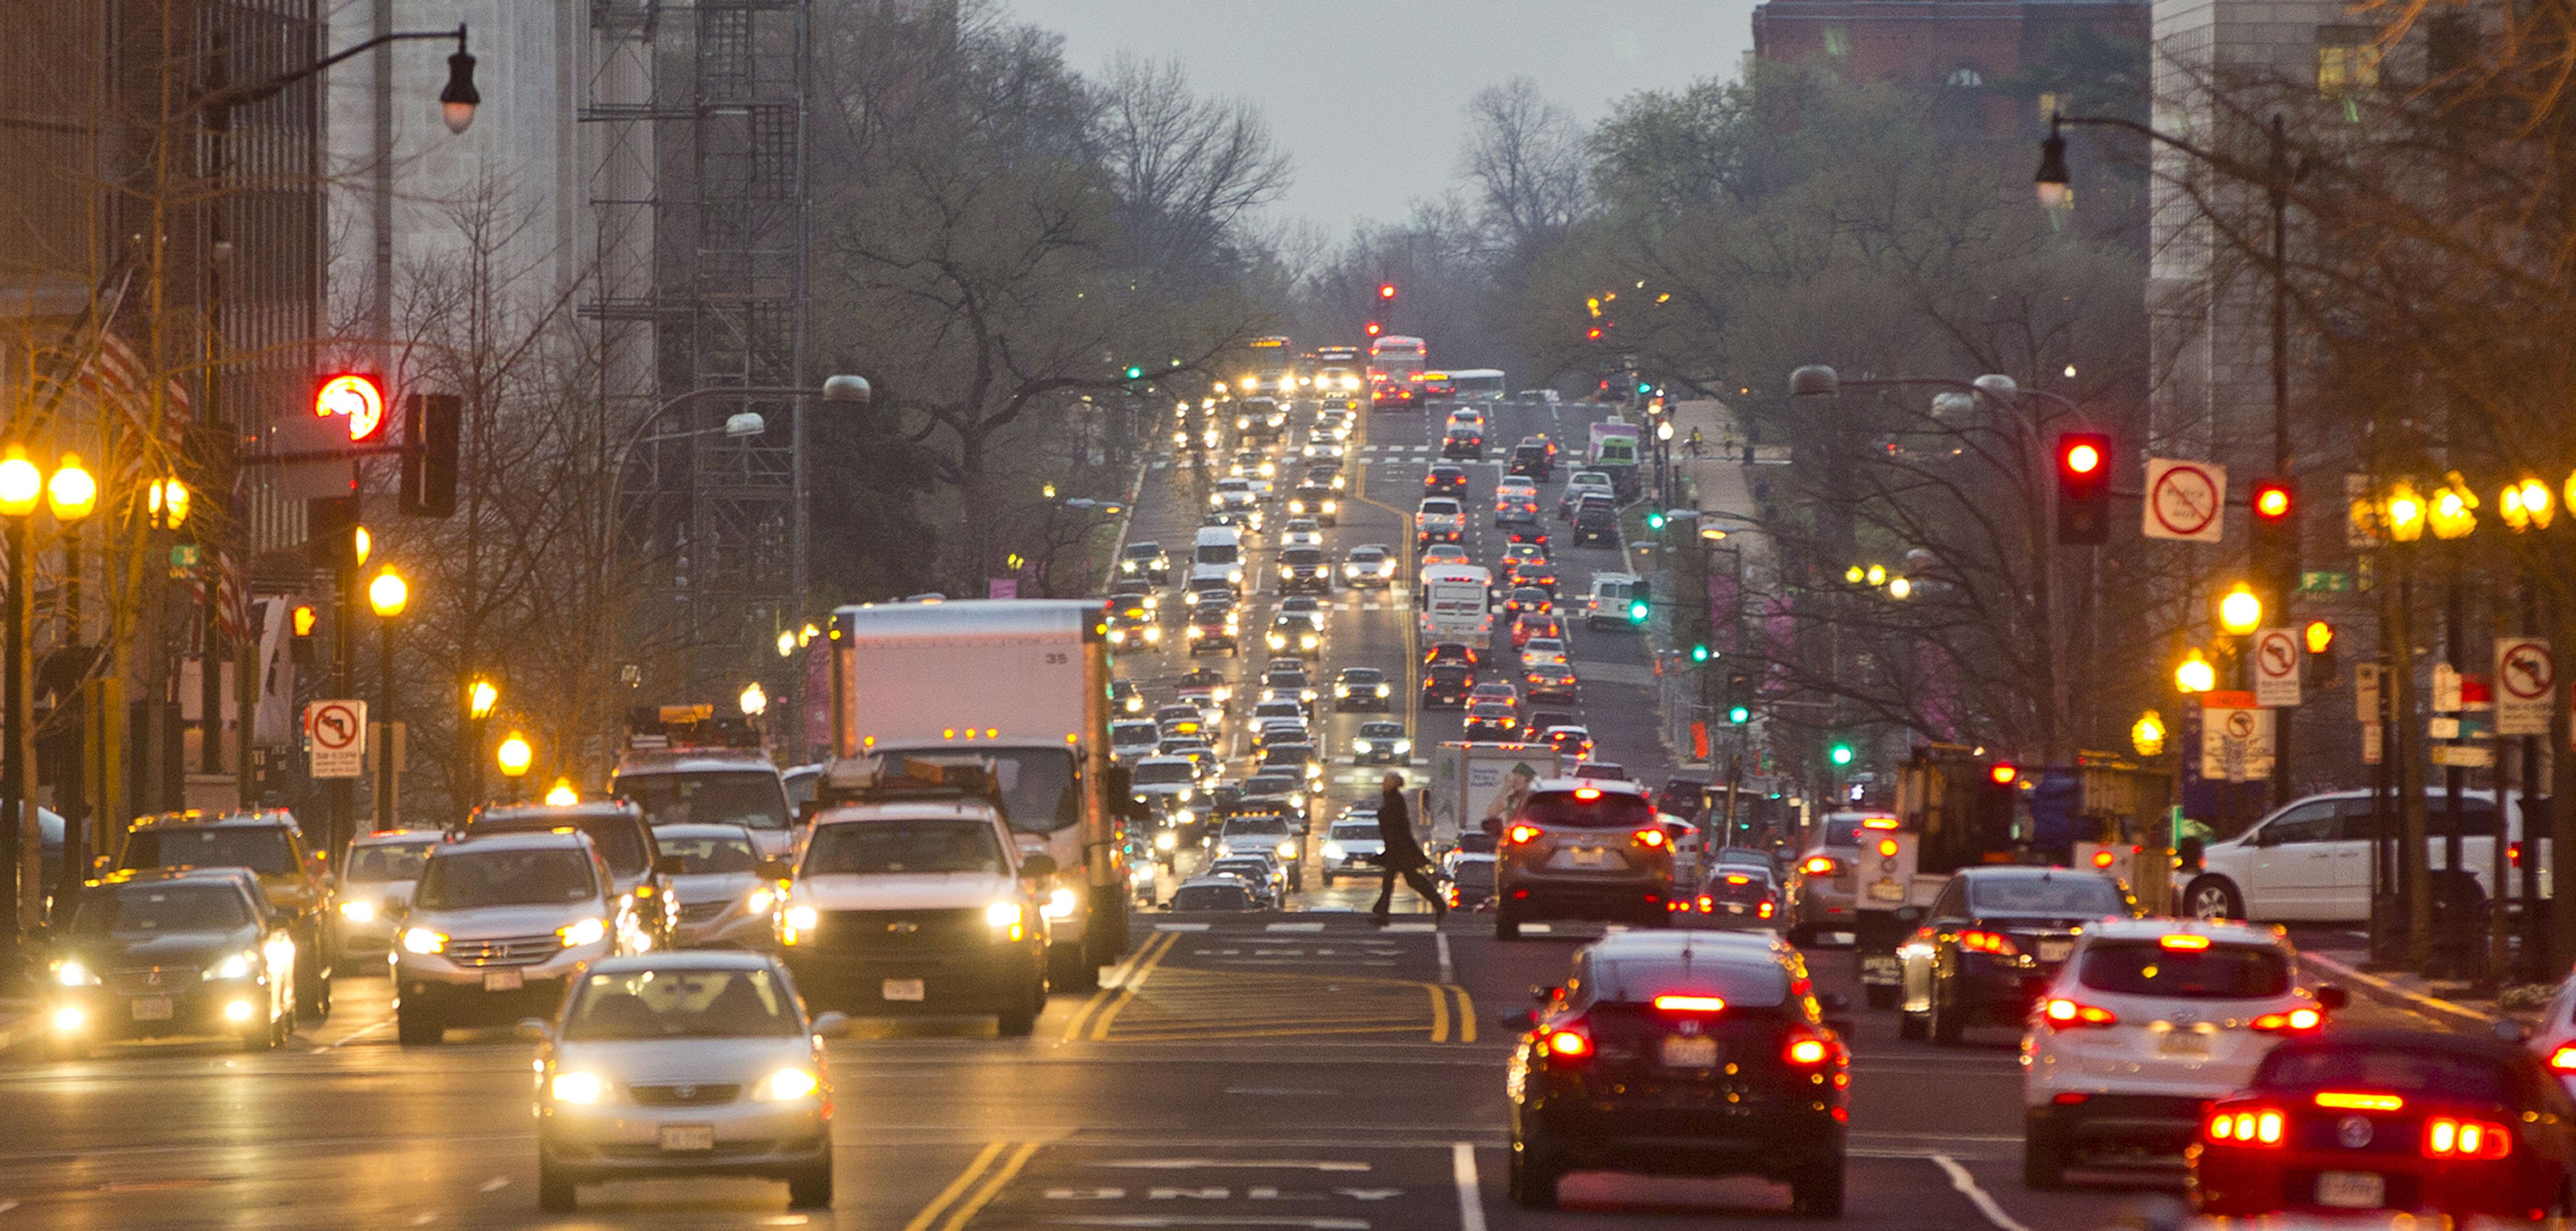 Morning traffic street photo